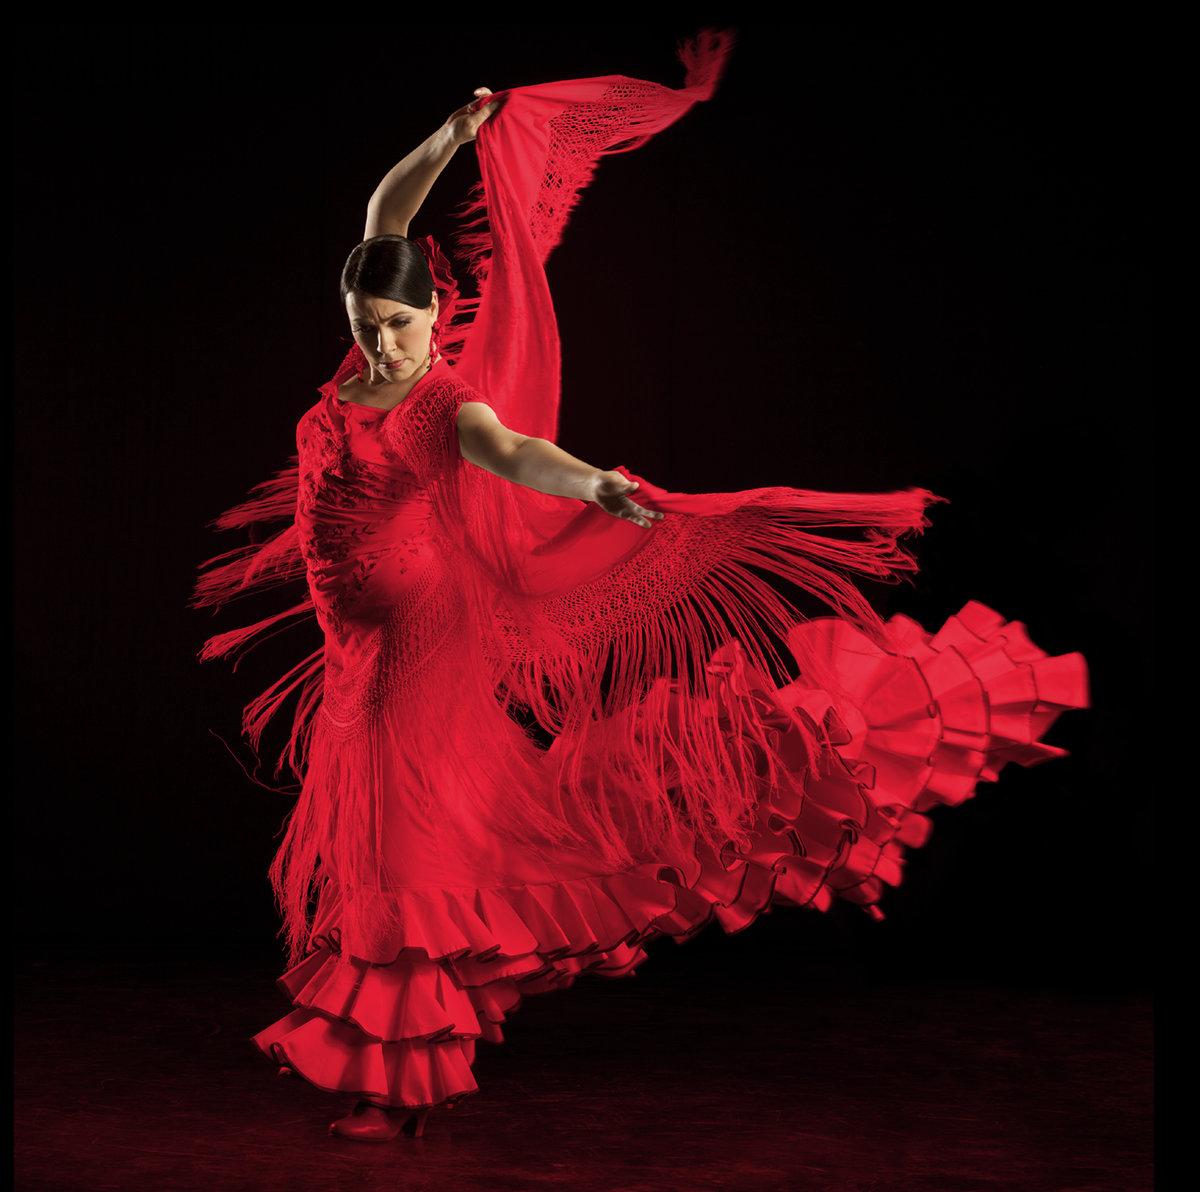 танцовщица фламенко фото